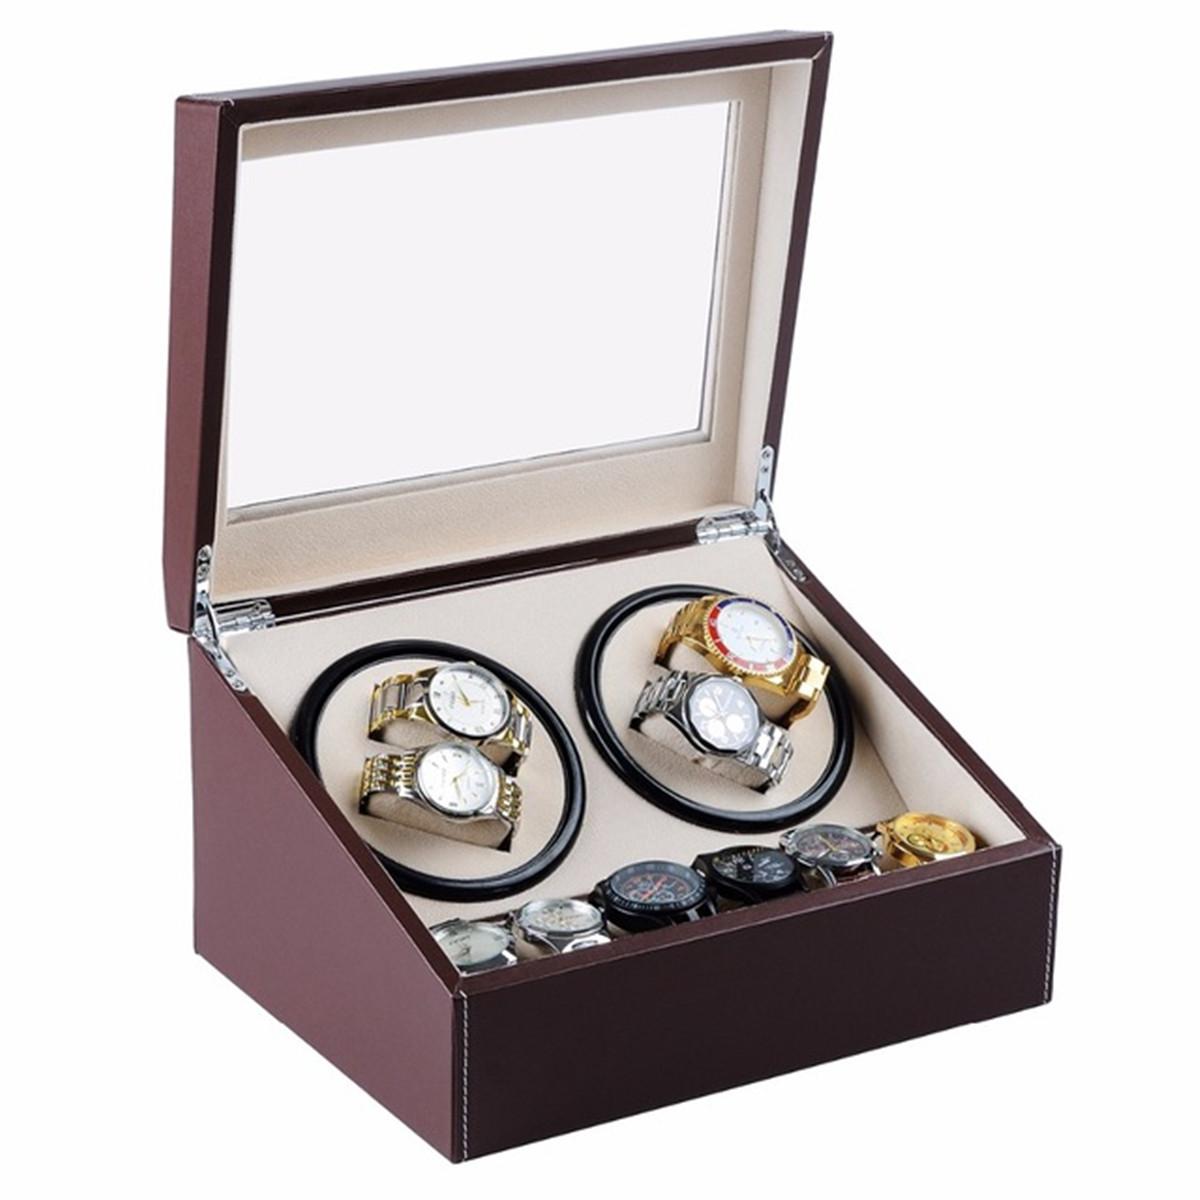 Luxury pu leather automatic 4 6 watch winder rotator for 4 box auto